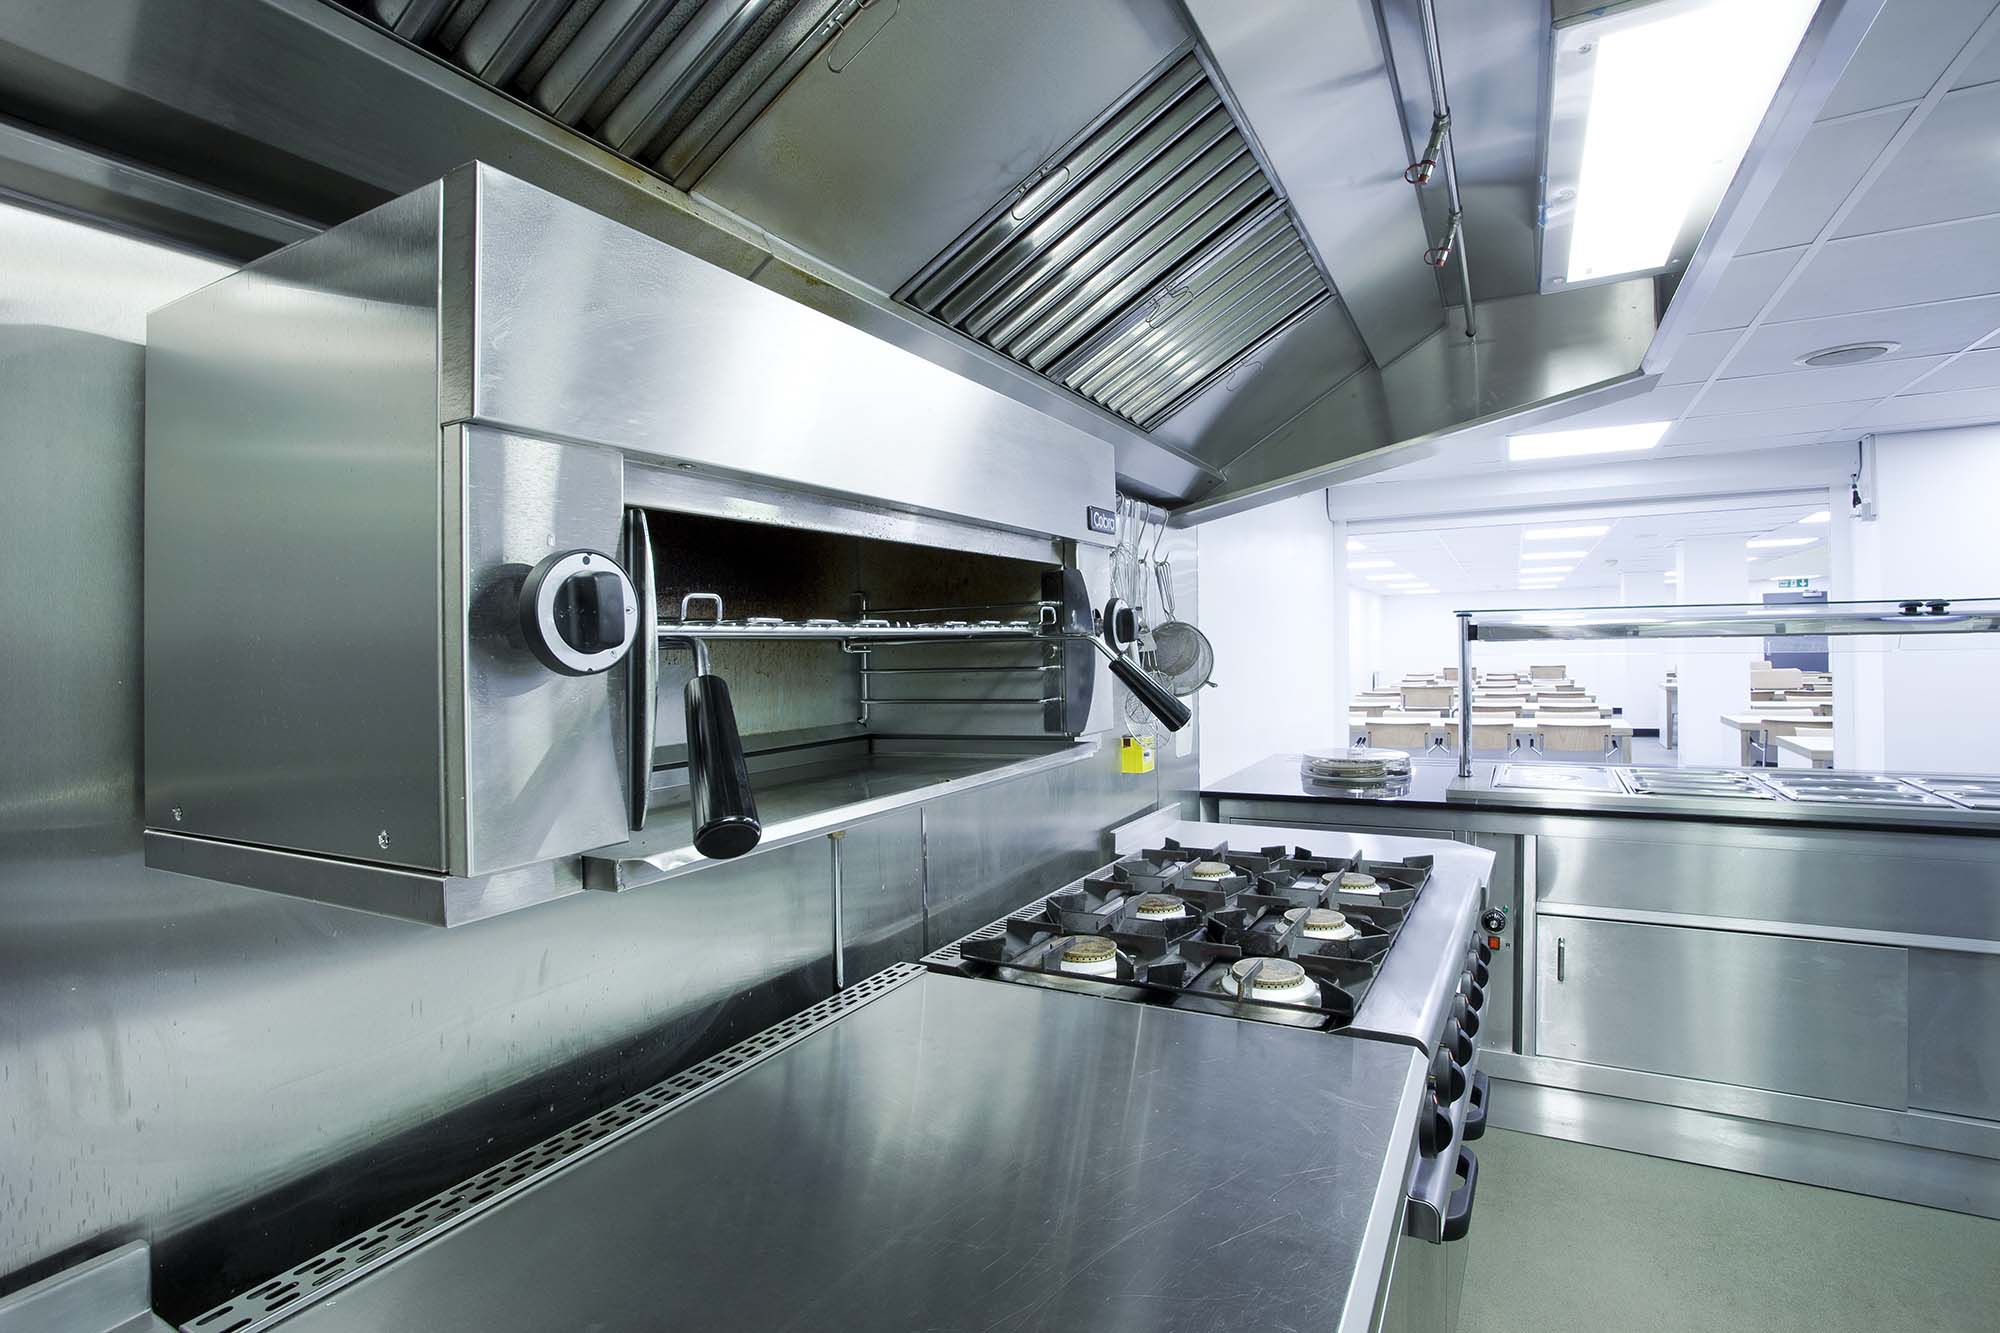 Projekt Technologiczny Kuchni Lokalu Gastronomicznego Teren